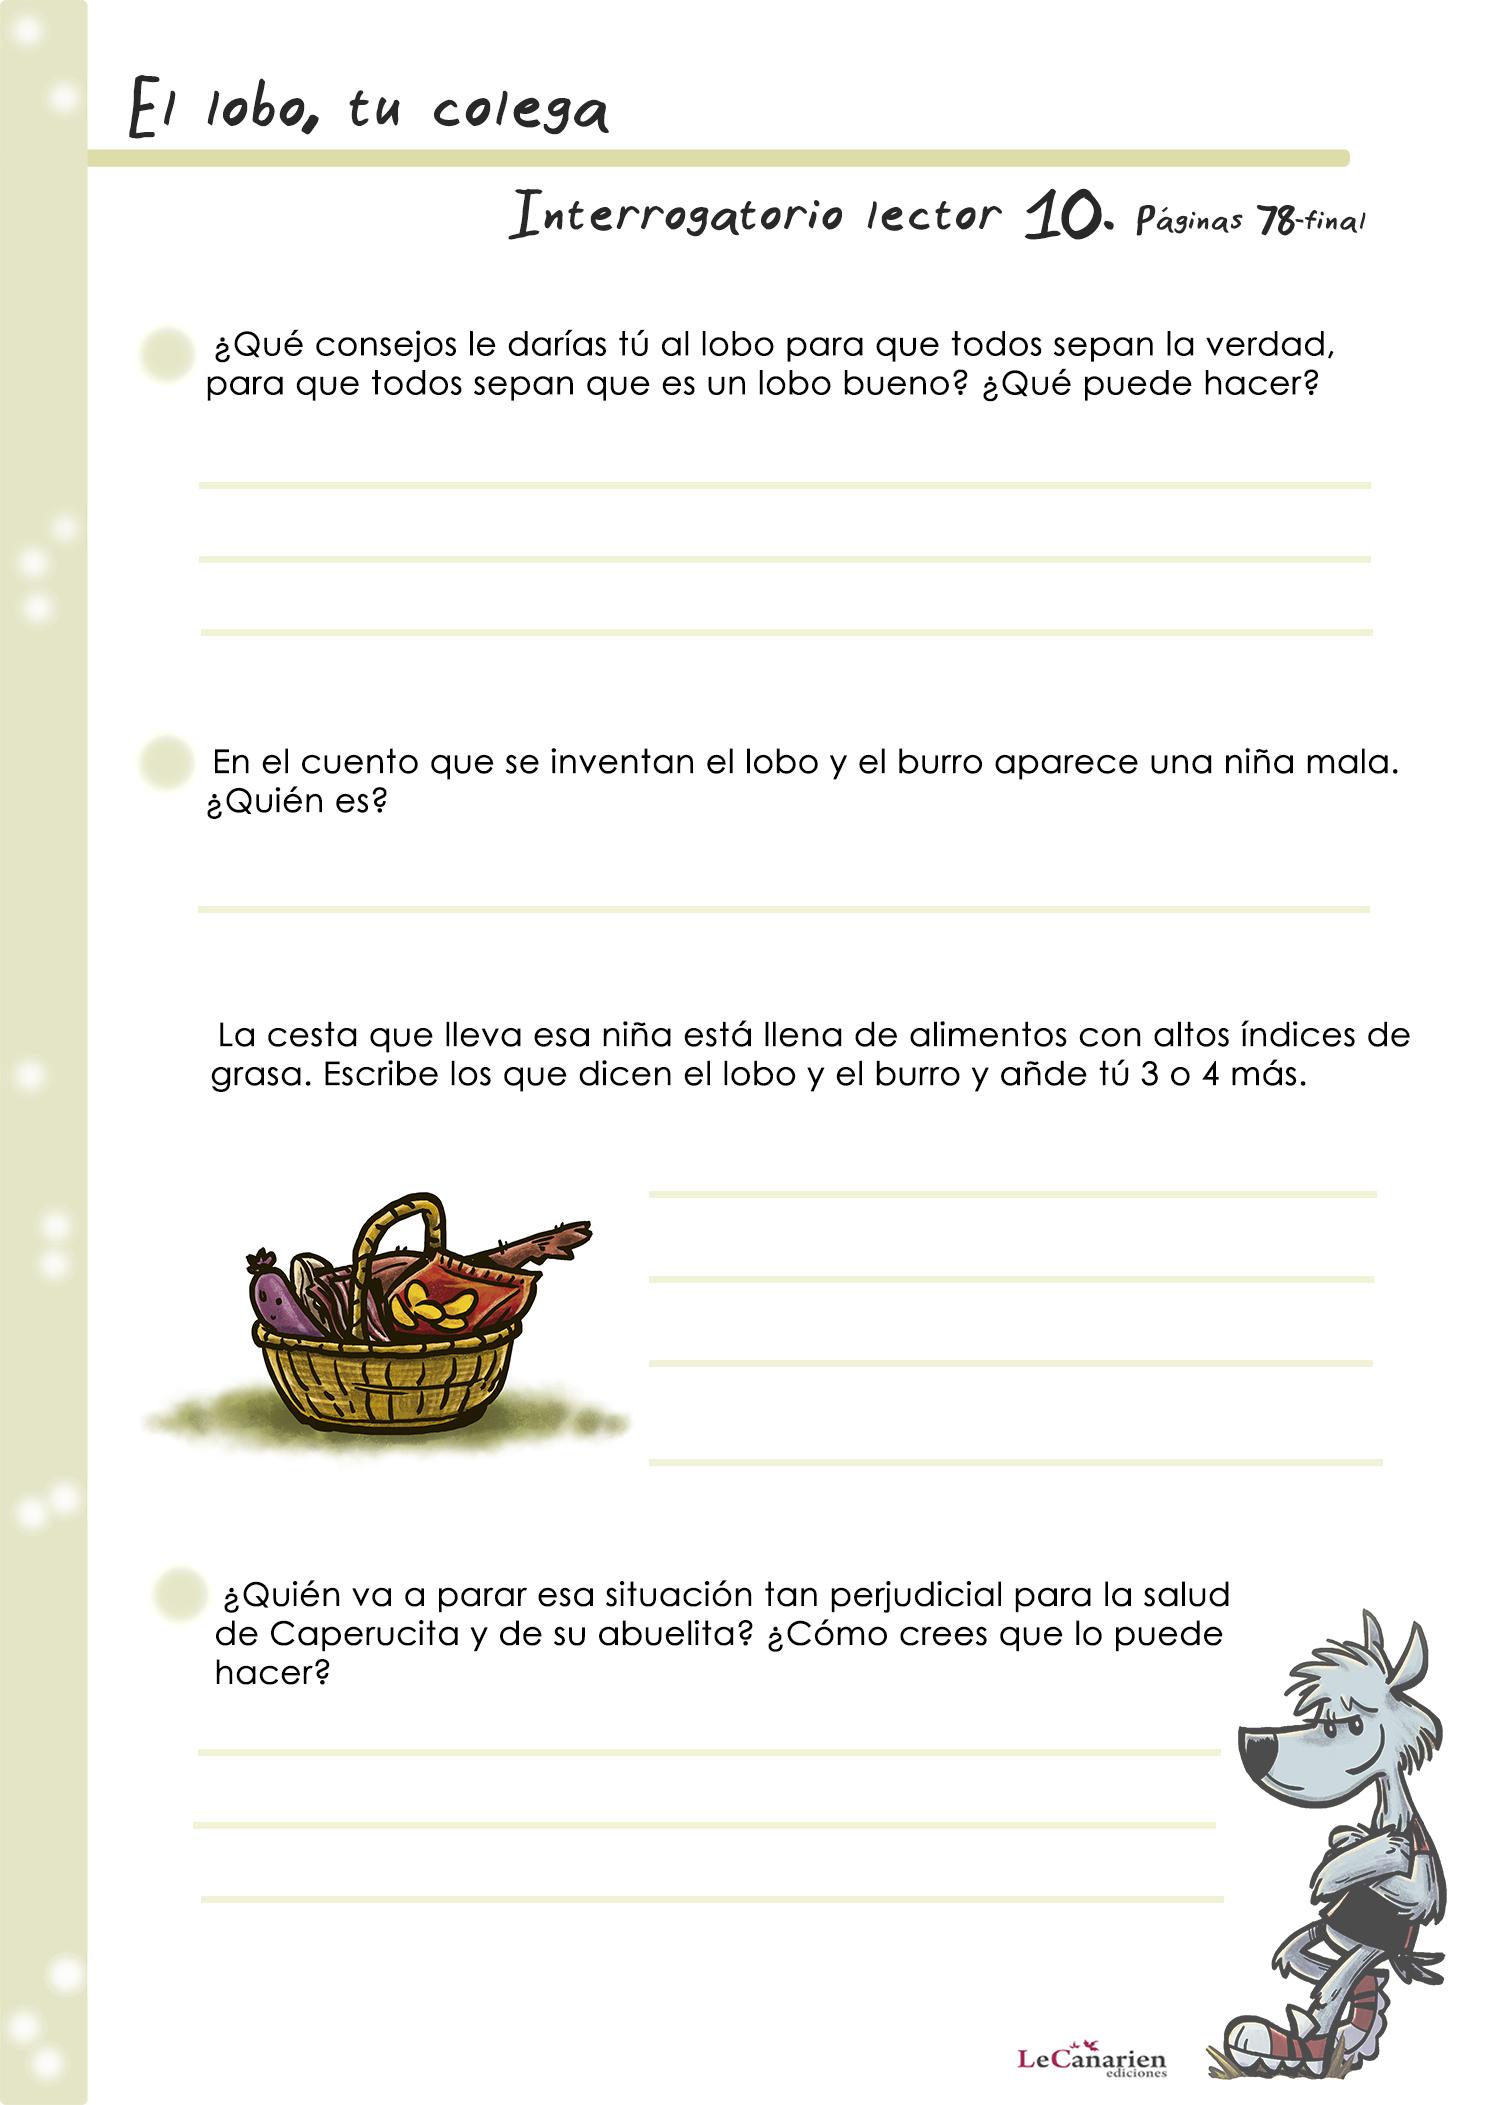 INTERROGATORIO LECTOR 10